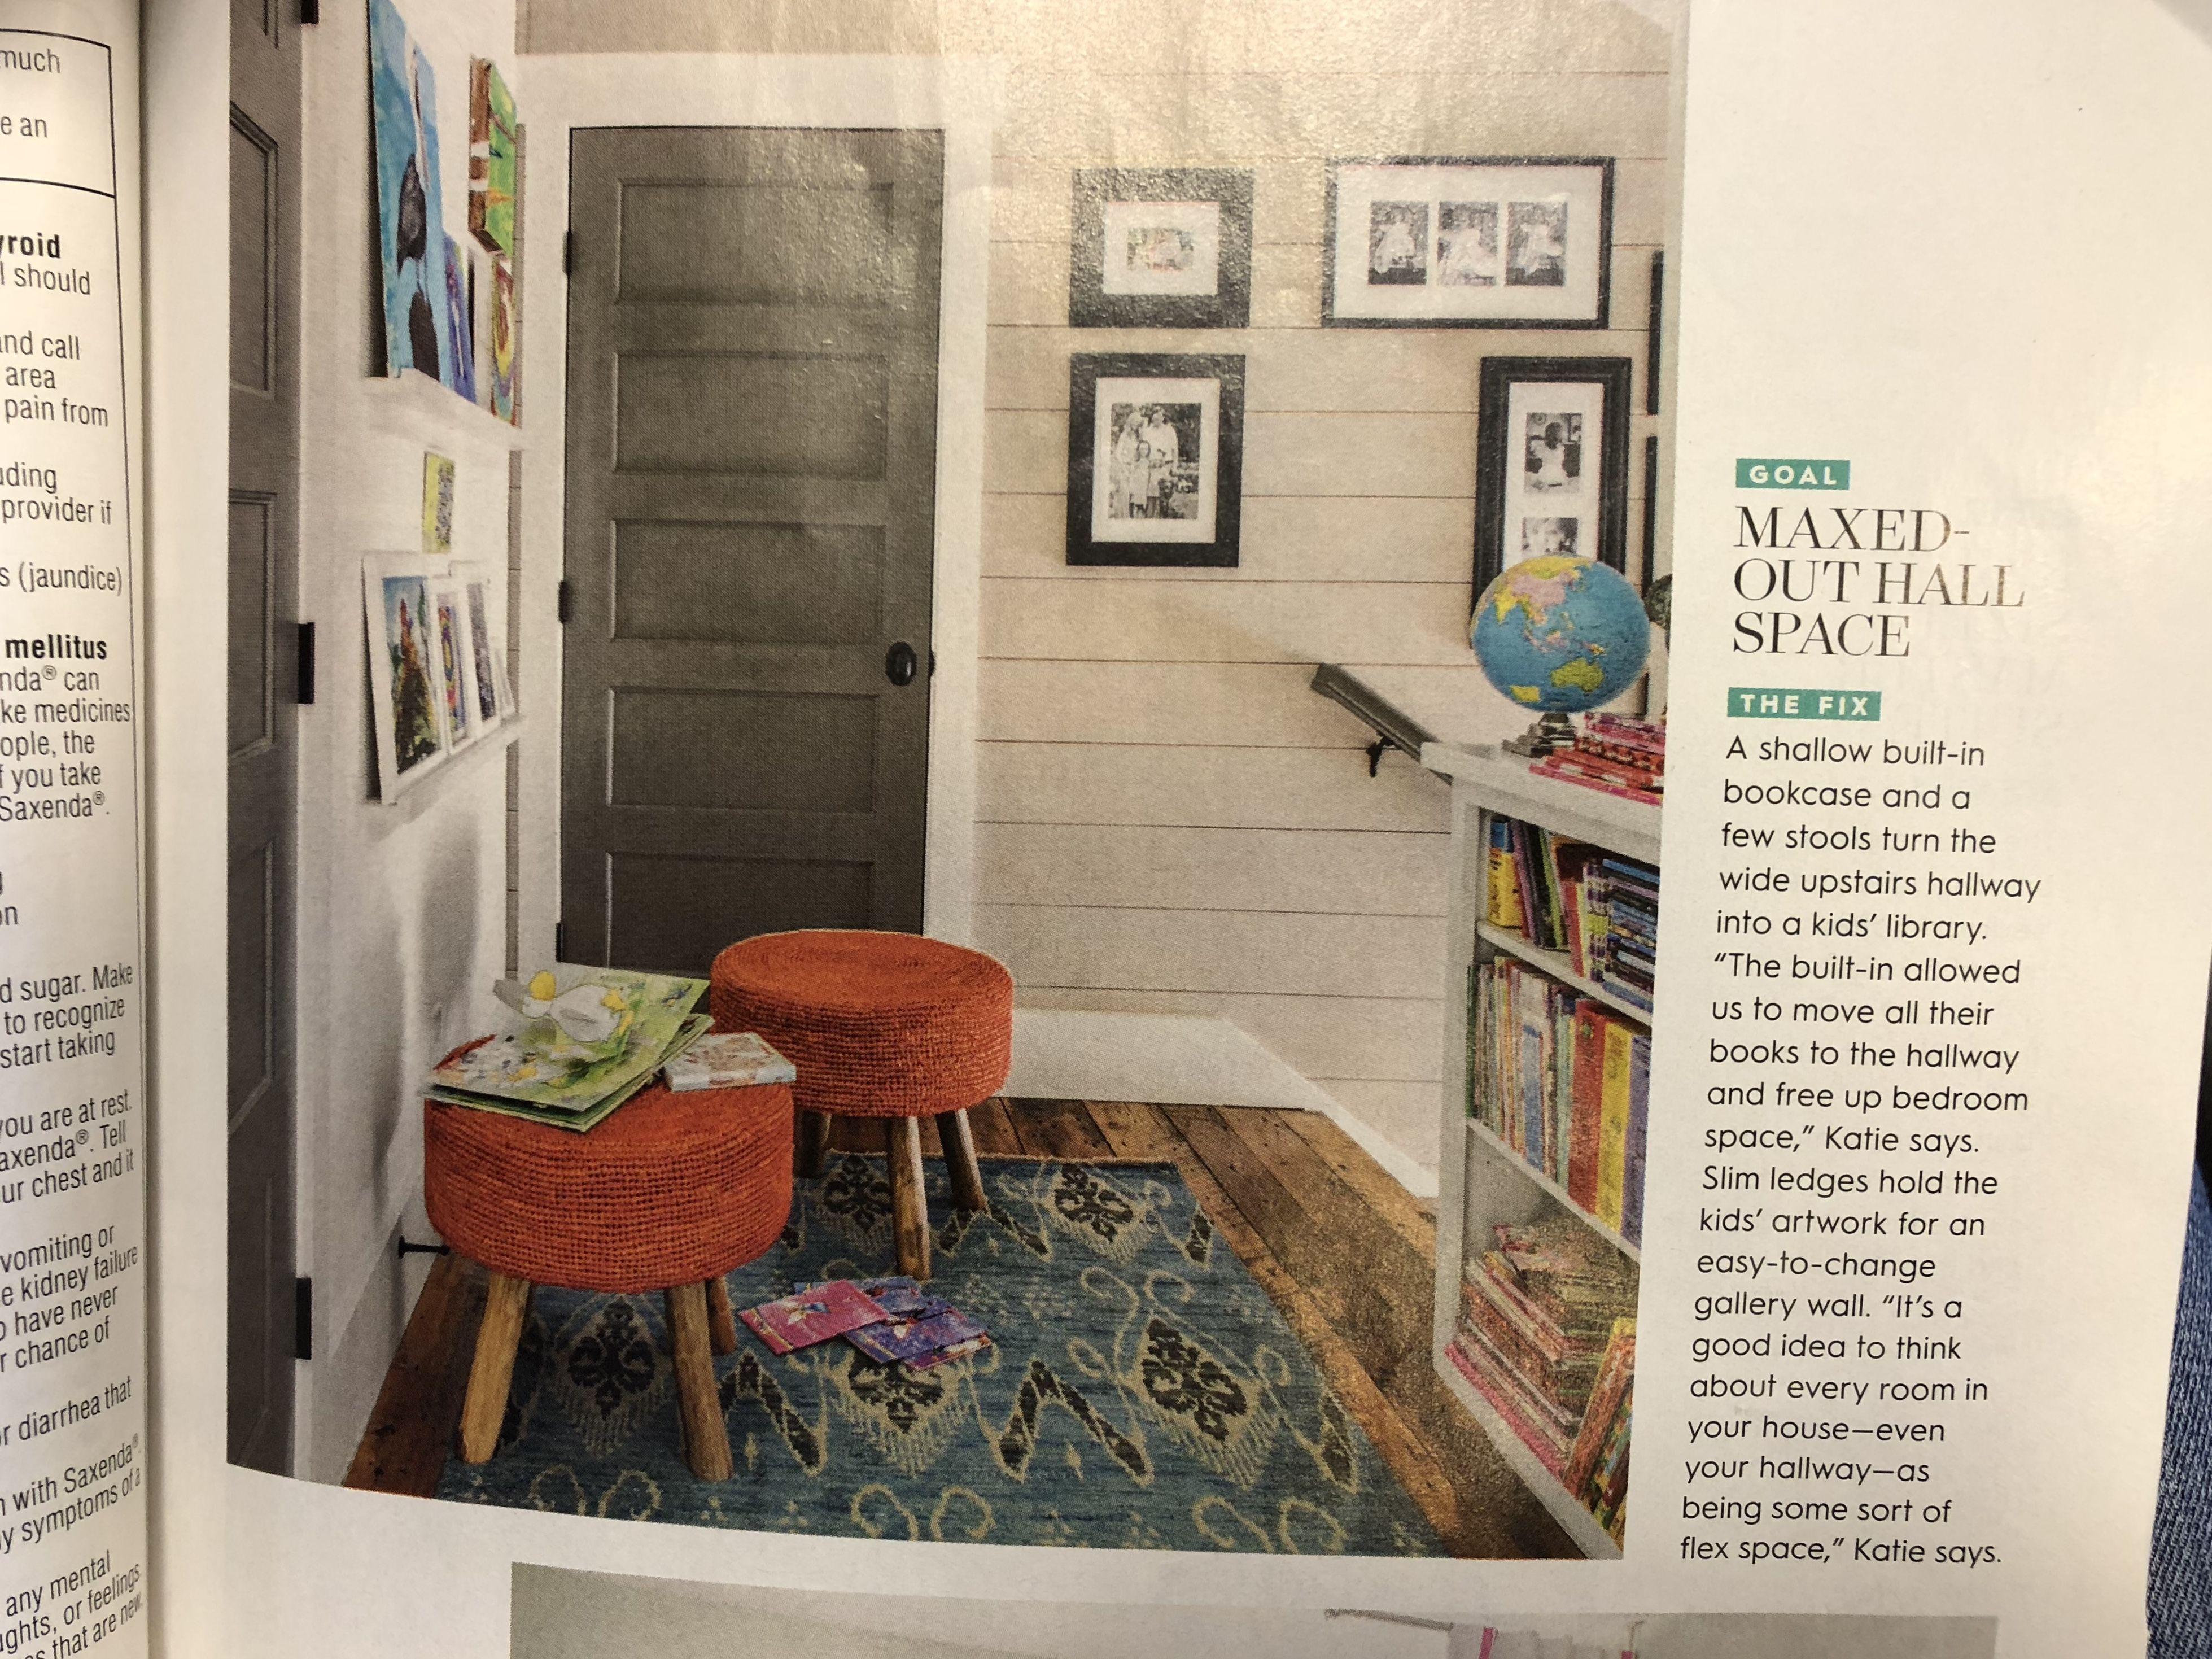 Hallway bookshelves #hallwaybookshelves Hallway bookshelves #hallwaybookshelves Hallway bookshelves #hallwaybookshelves Hallway bookshelves #hallwaybookshelves